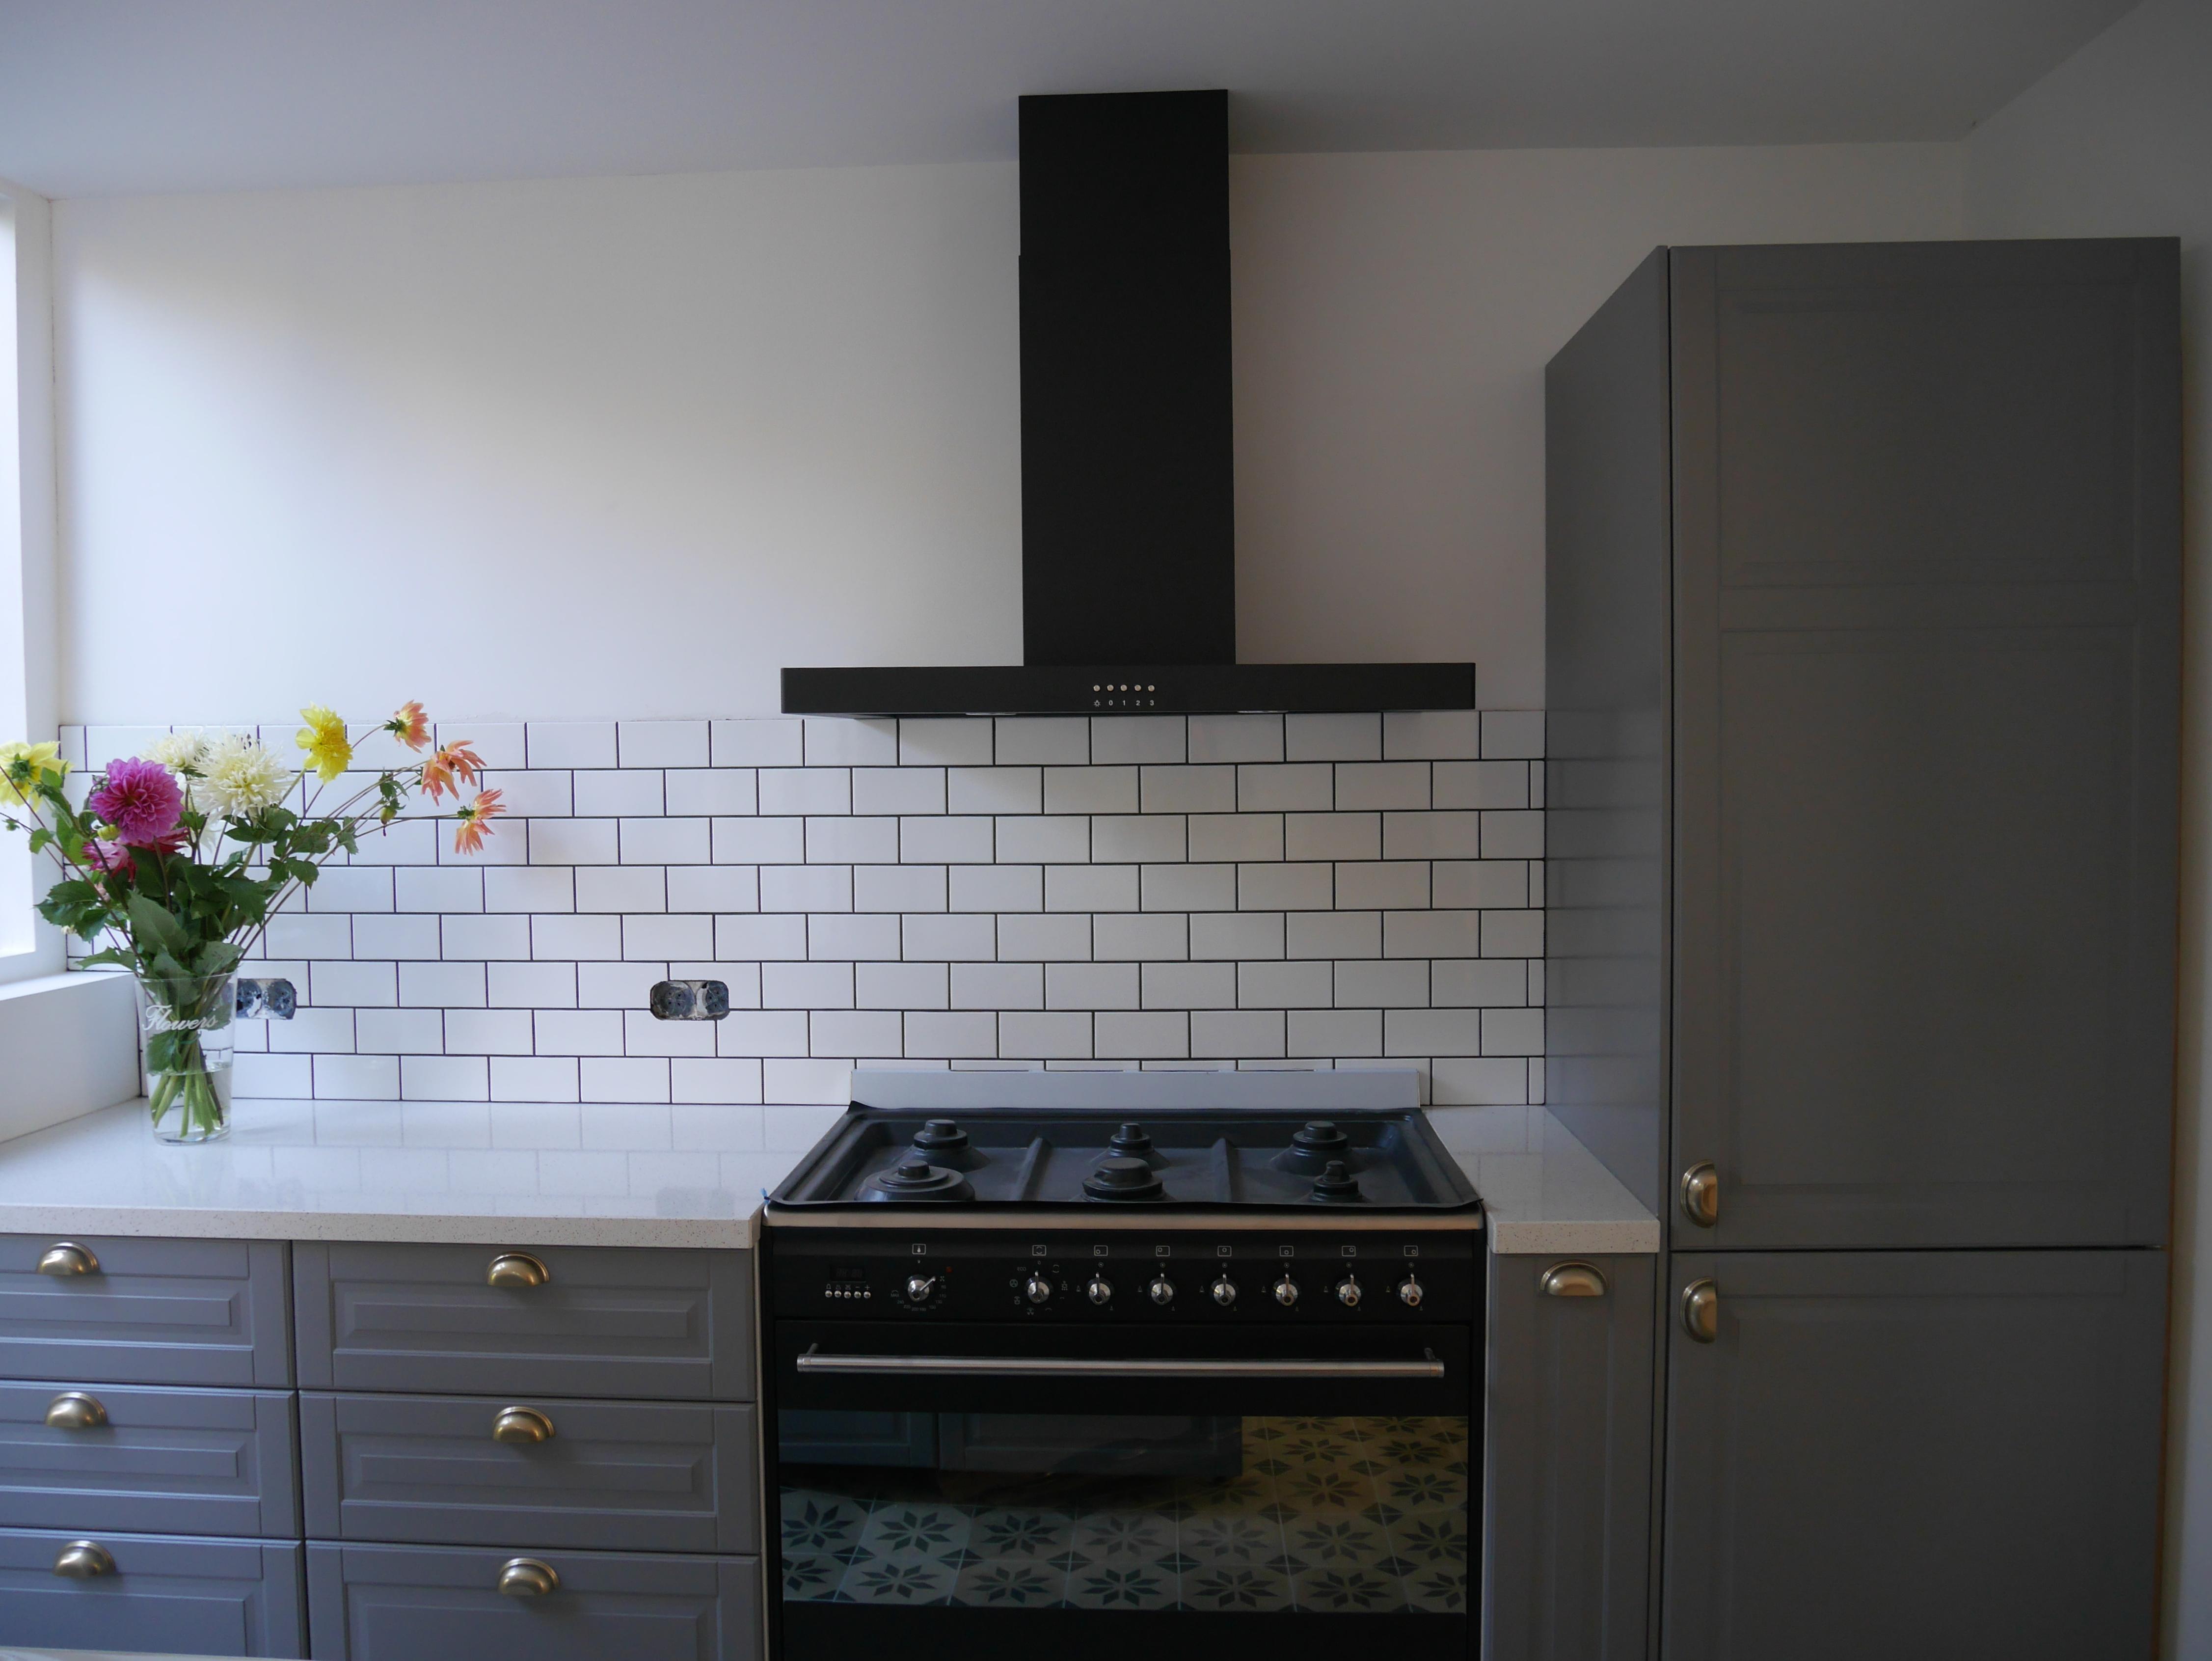 Opruiming Keukens Ikea : Uitverkoop keukens ikea stunning ikea keuken uitverkoop badkamer